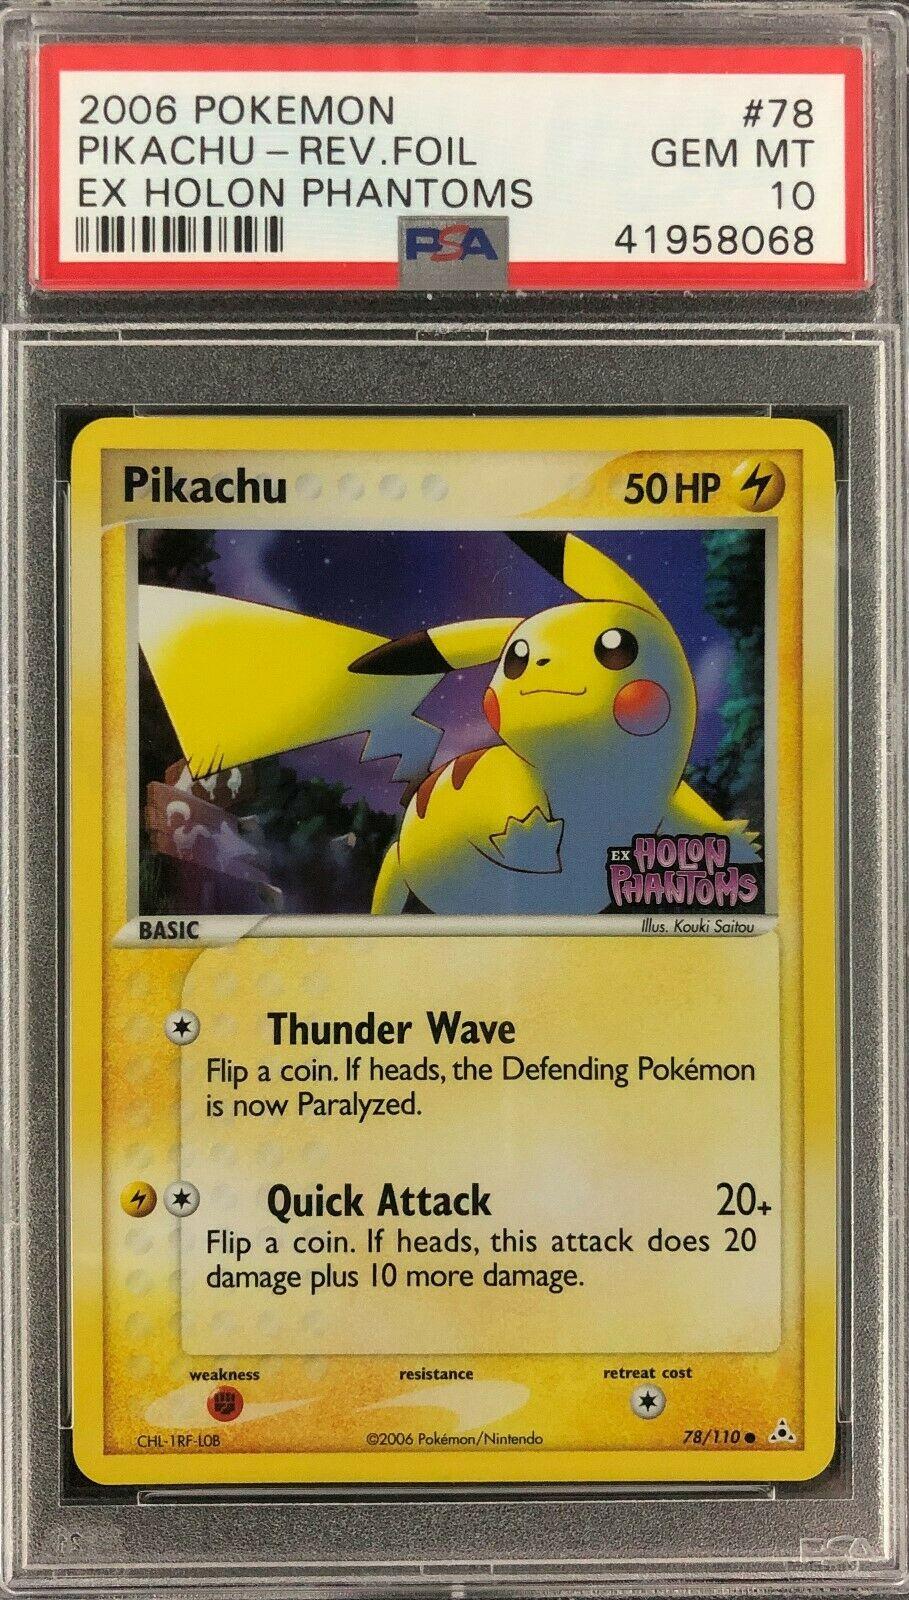 EX Holon Phantoms Pikachu Reverse Foil Holo Pokemon Card Mint PSA 10